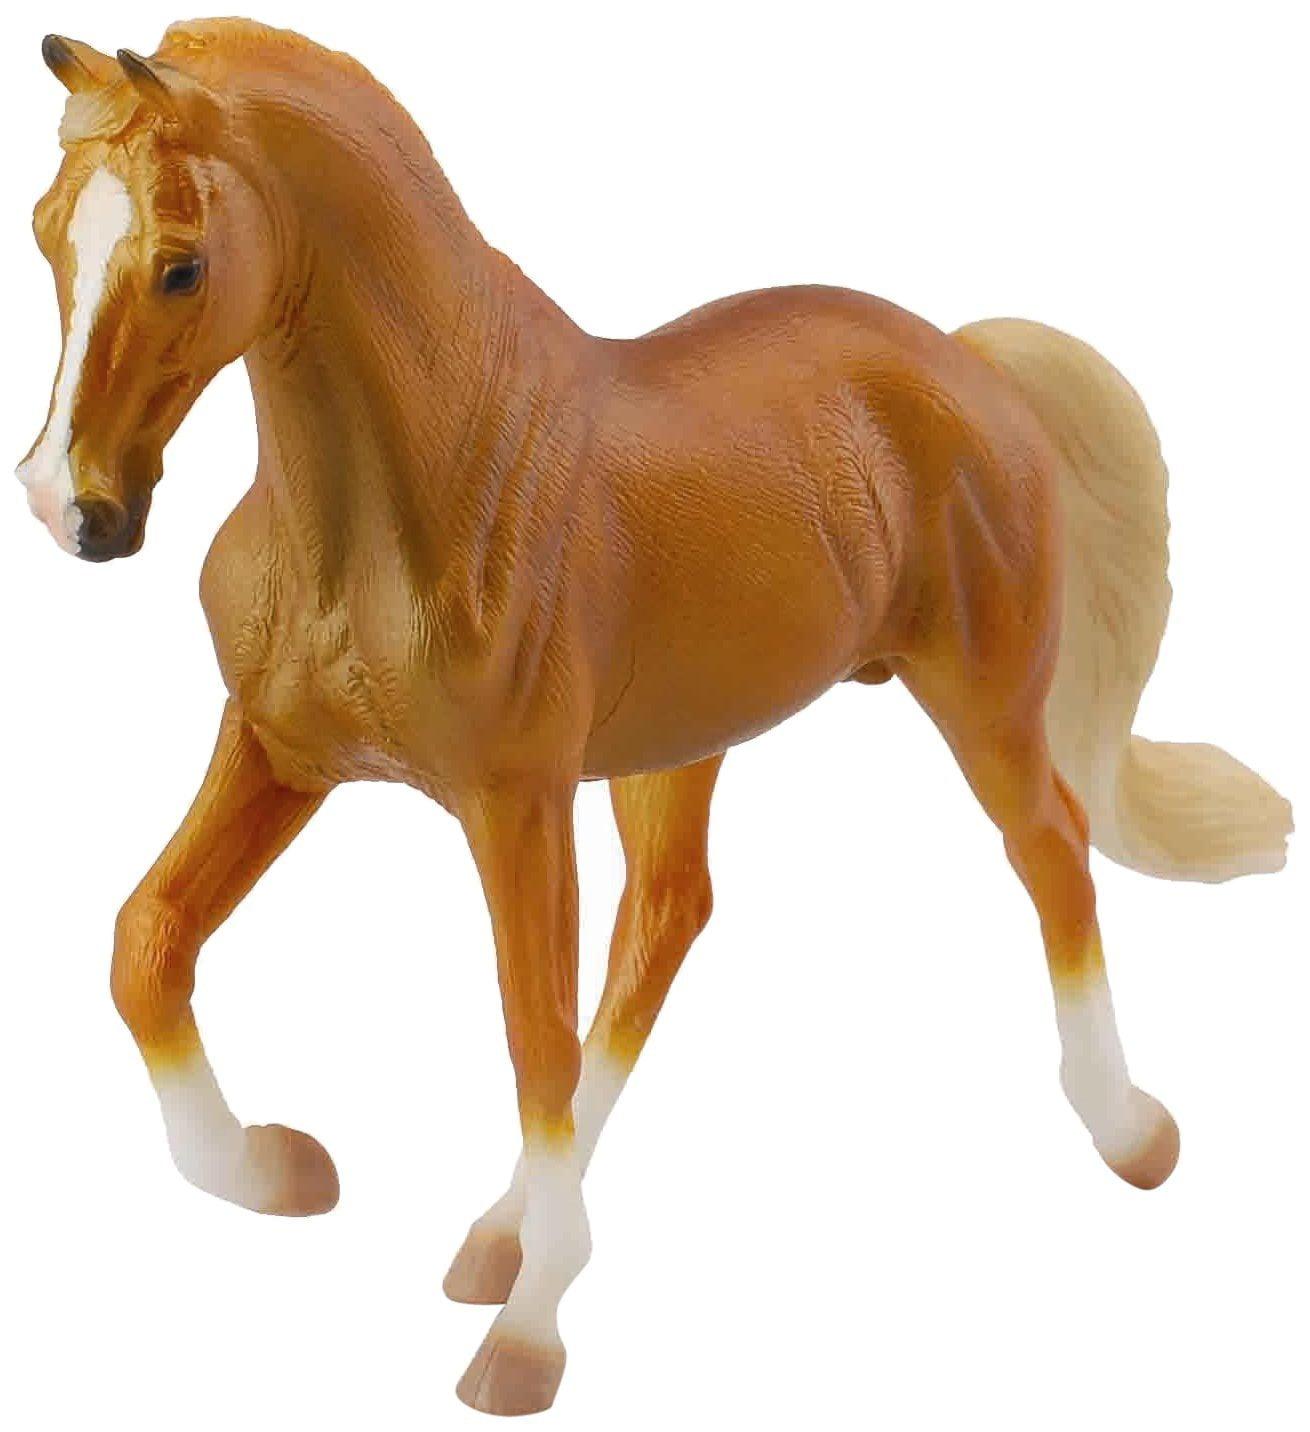 Breyer Collecta Series Tennessee Walking Horse Golden Palomino Model